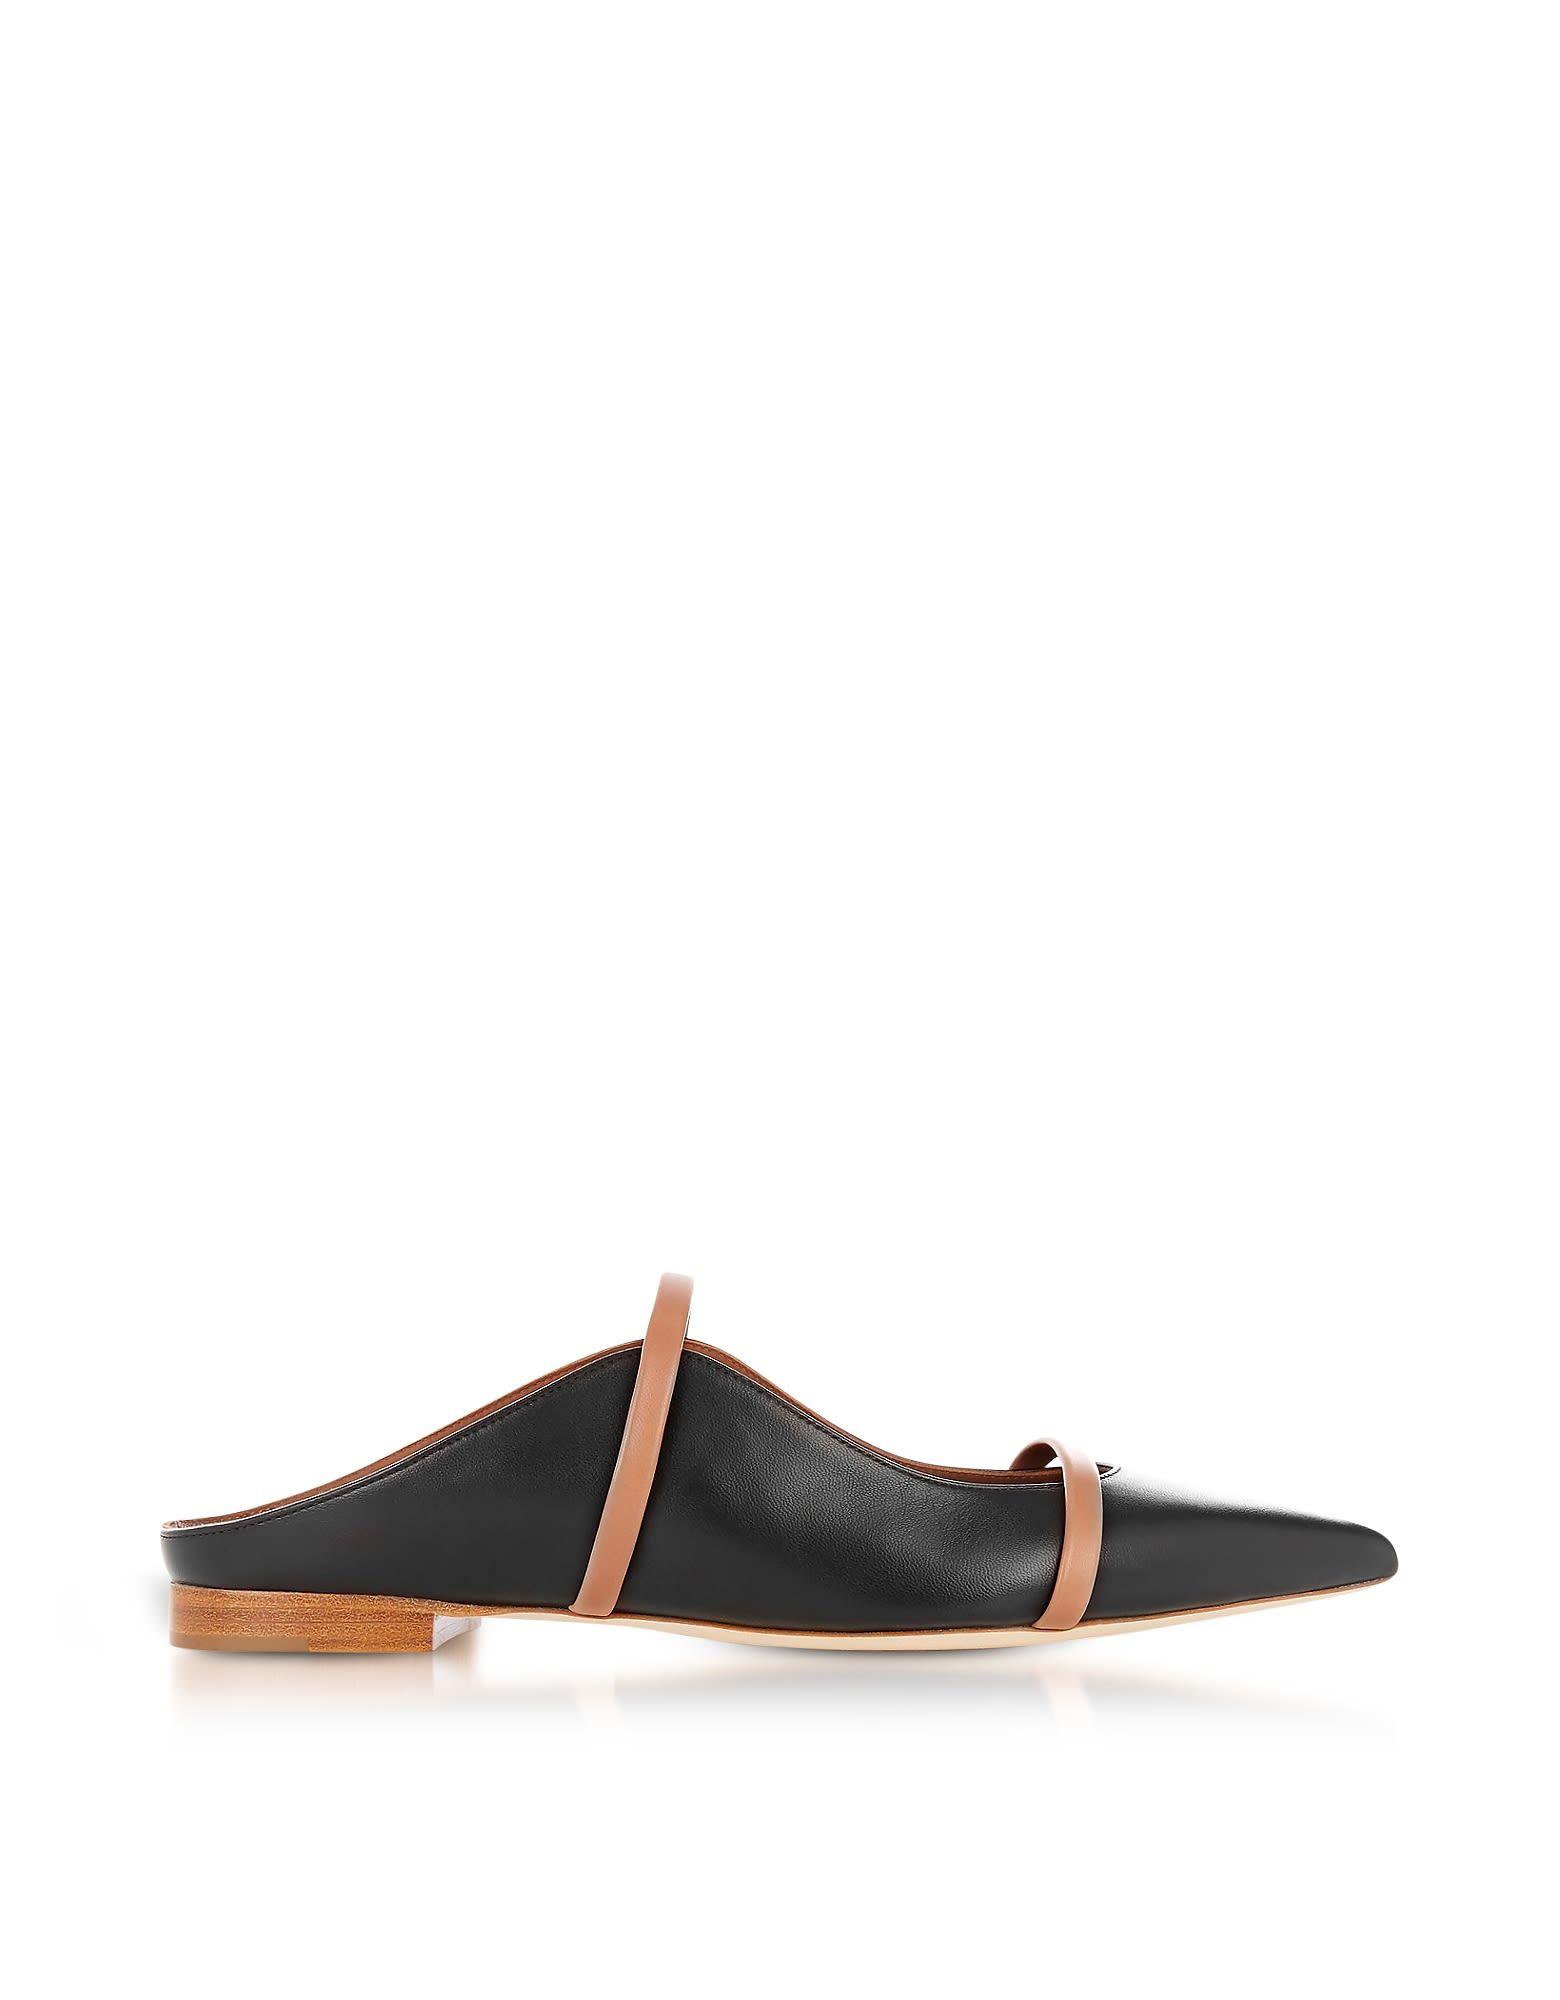 1da8523500 MALONE SOULIERS | Malone Souliers Malone Souliers Maureen Black And Nude  Nappa Leather Flat Mules #Shoes #Flat Shoes #MALONE SOULIERS